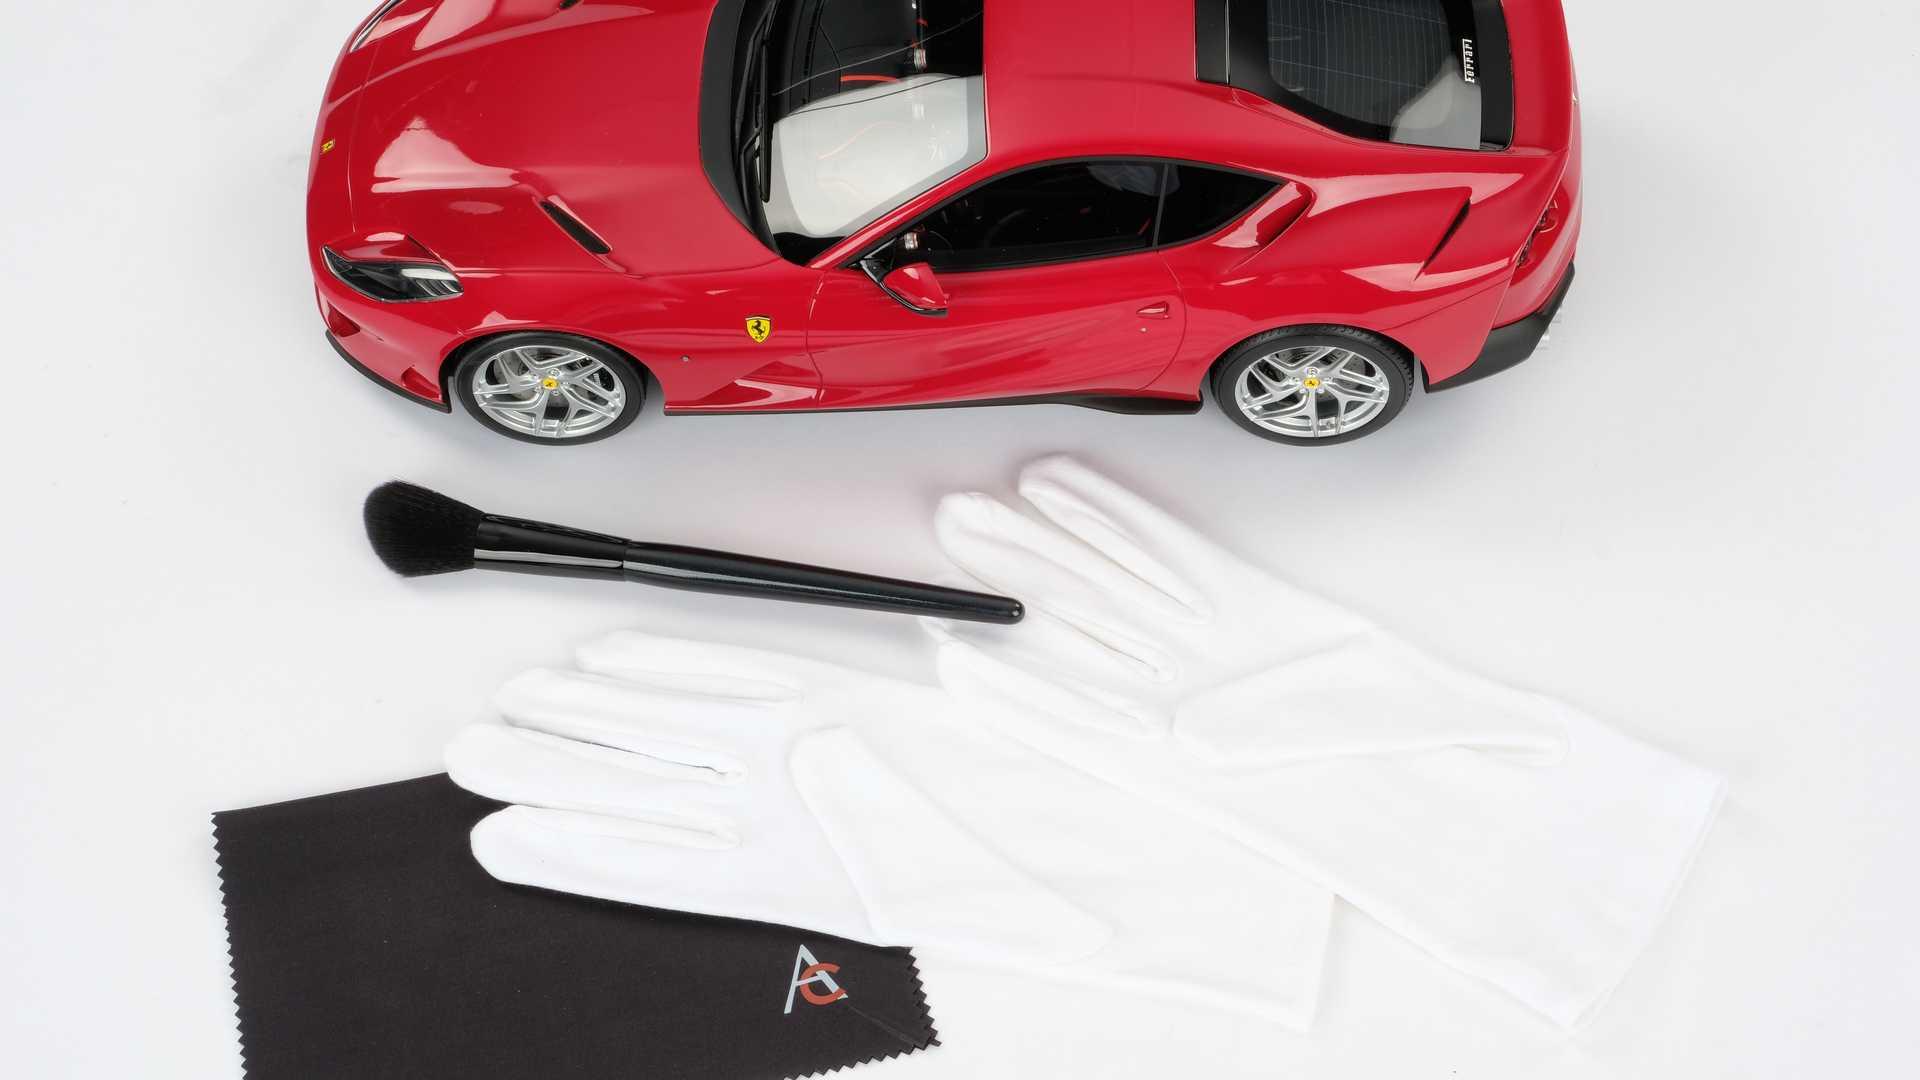 Ferrari 812 Superfast Scale Model By Amalgam